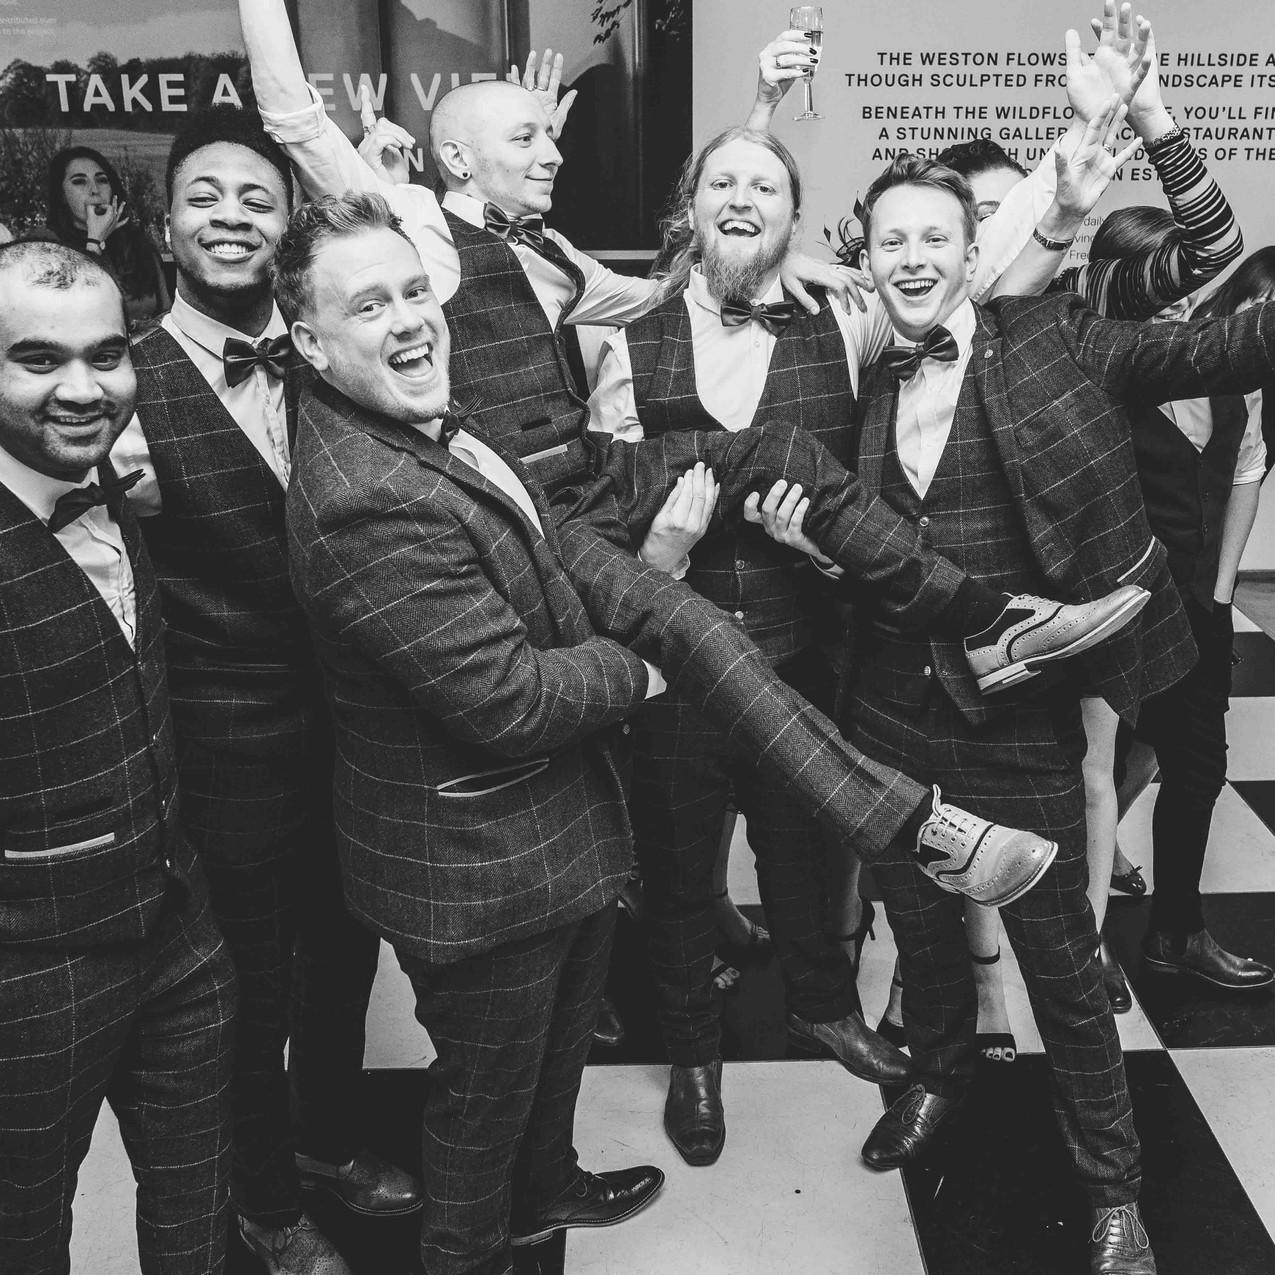 Jamie and his lads wedding